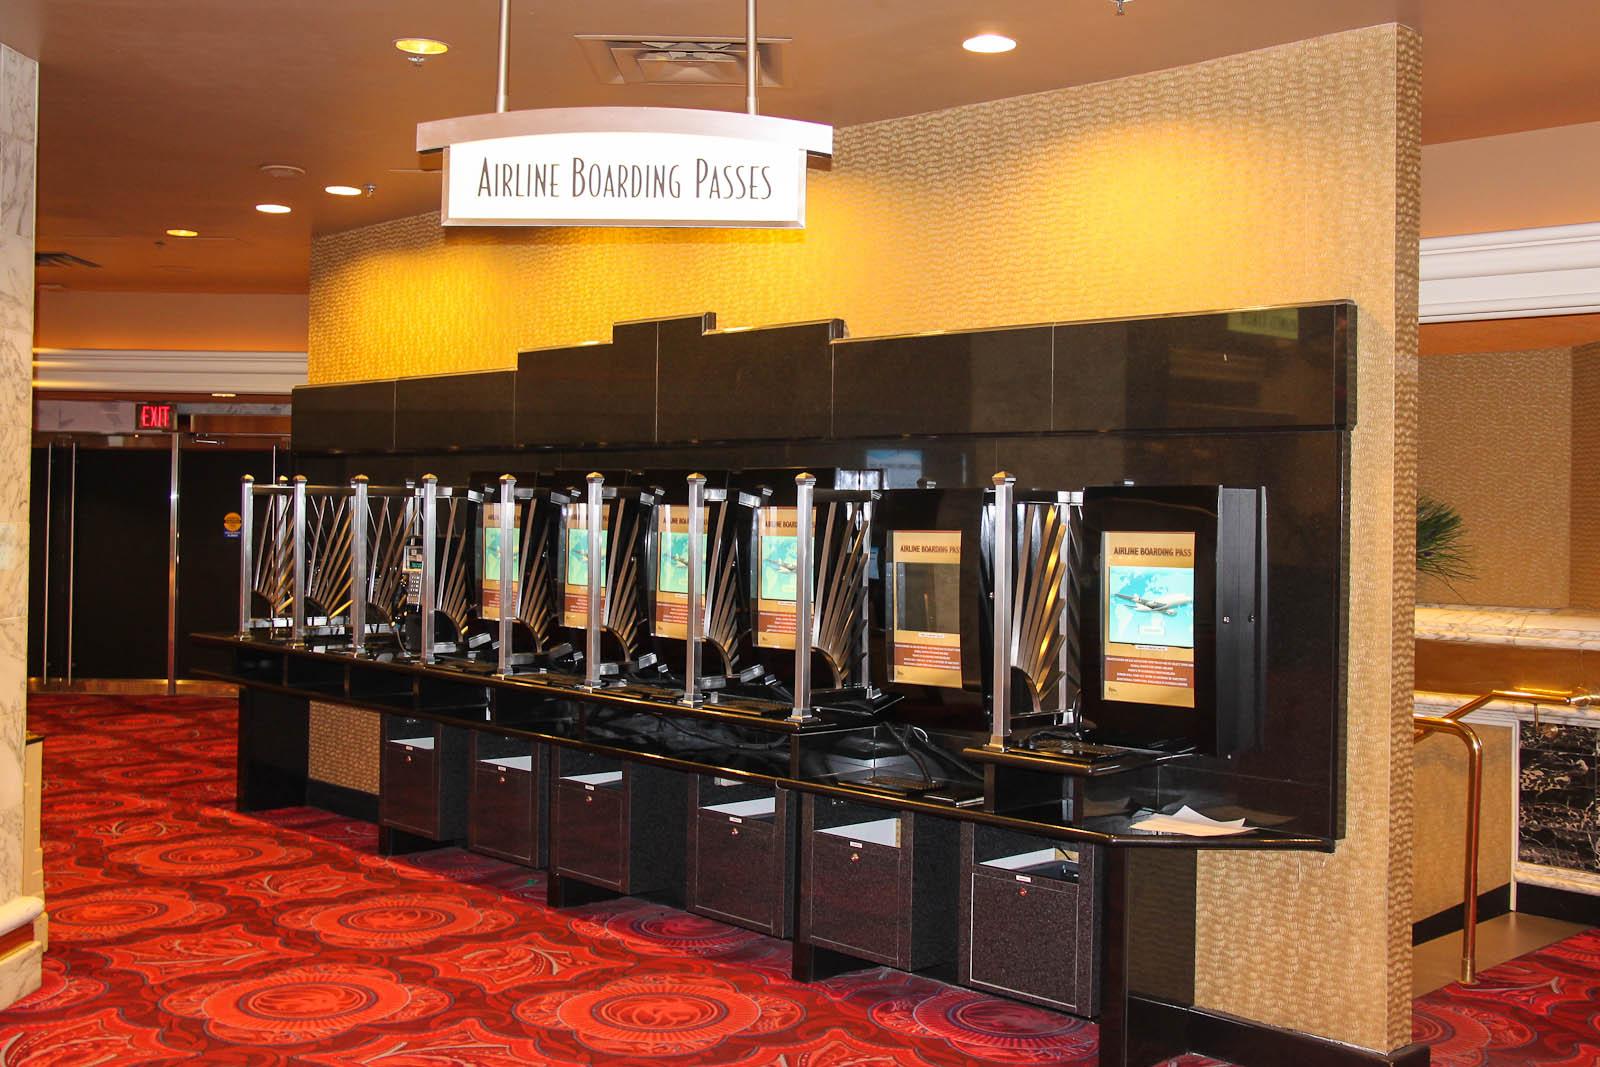 ������ ��������������� �� ��������� � ����� MGM Grand � ���-������